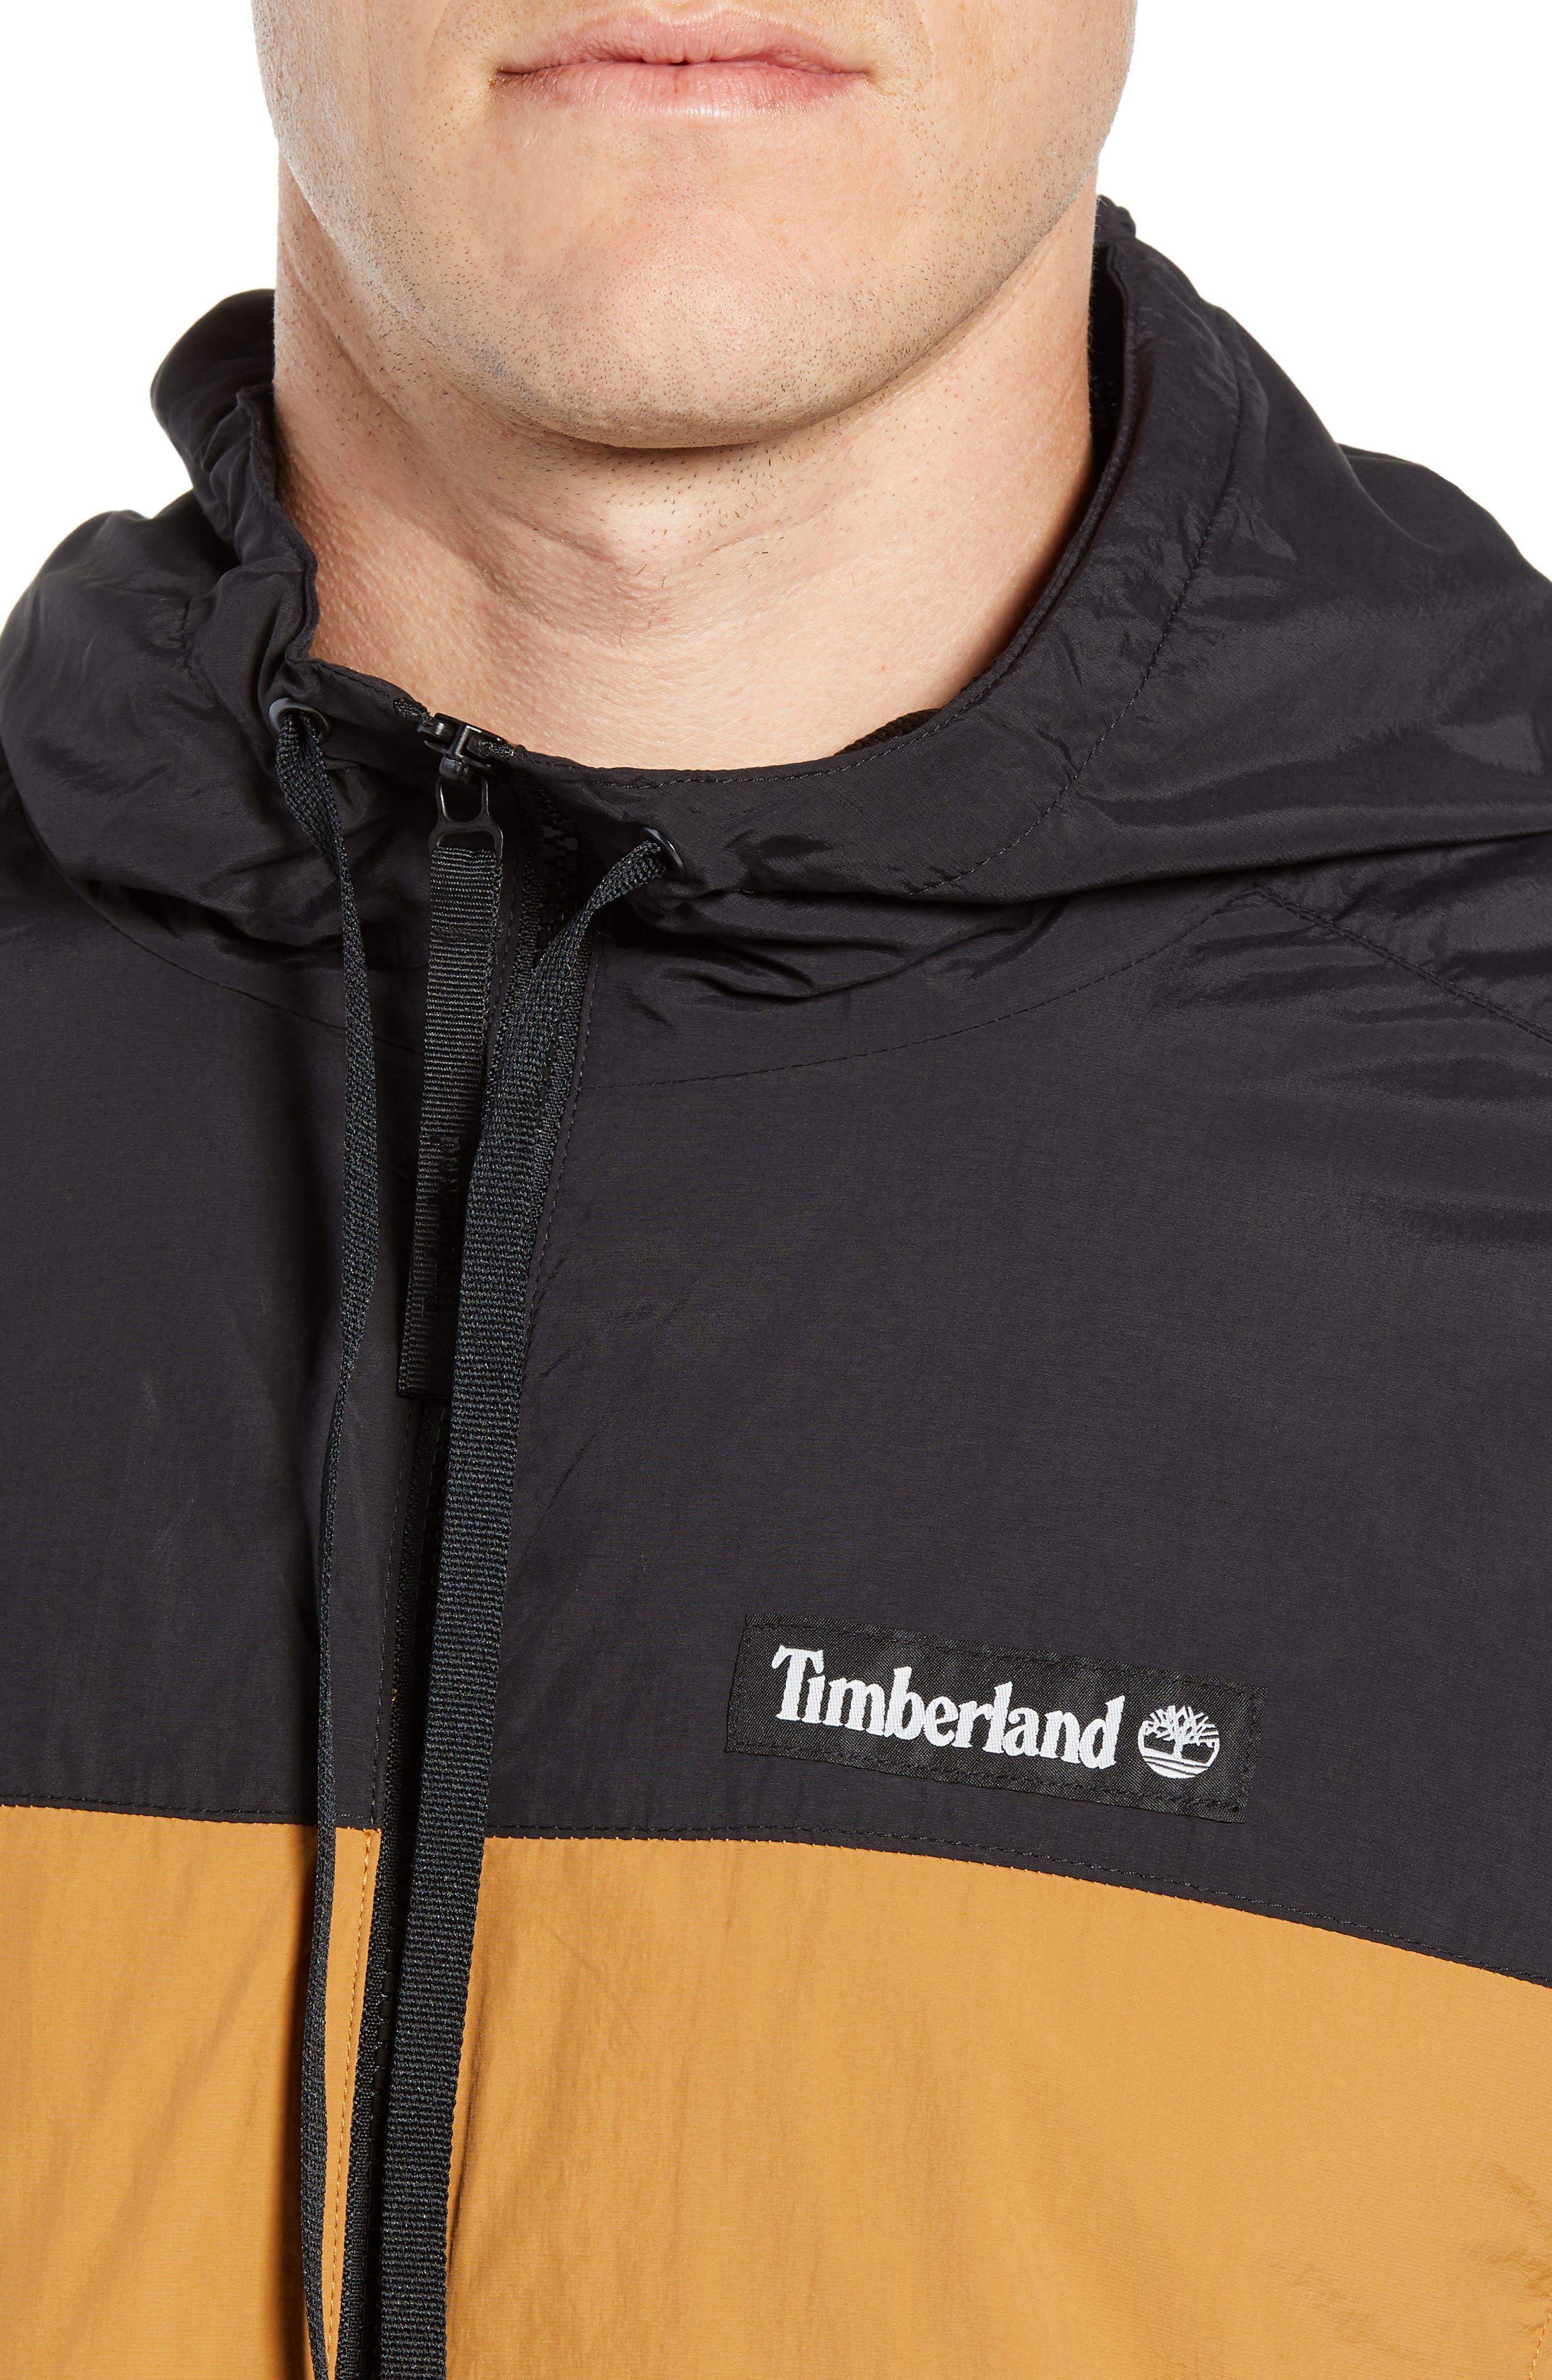 Windbreaker Hooded Jacket,                             Alternate thumbnail 4, color,                             WHEAT BOOT/ BLACK